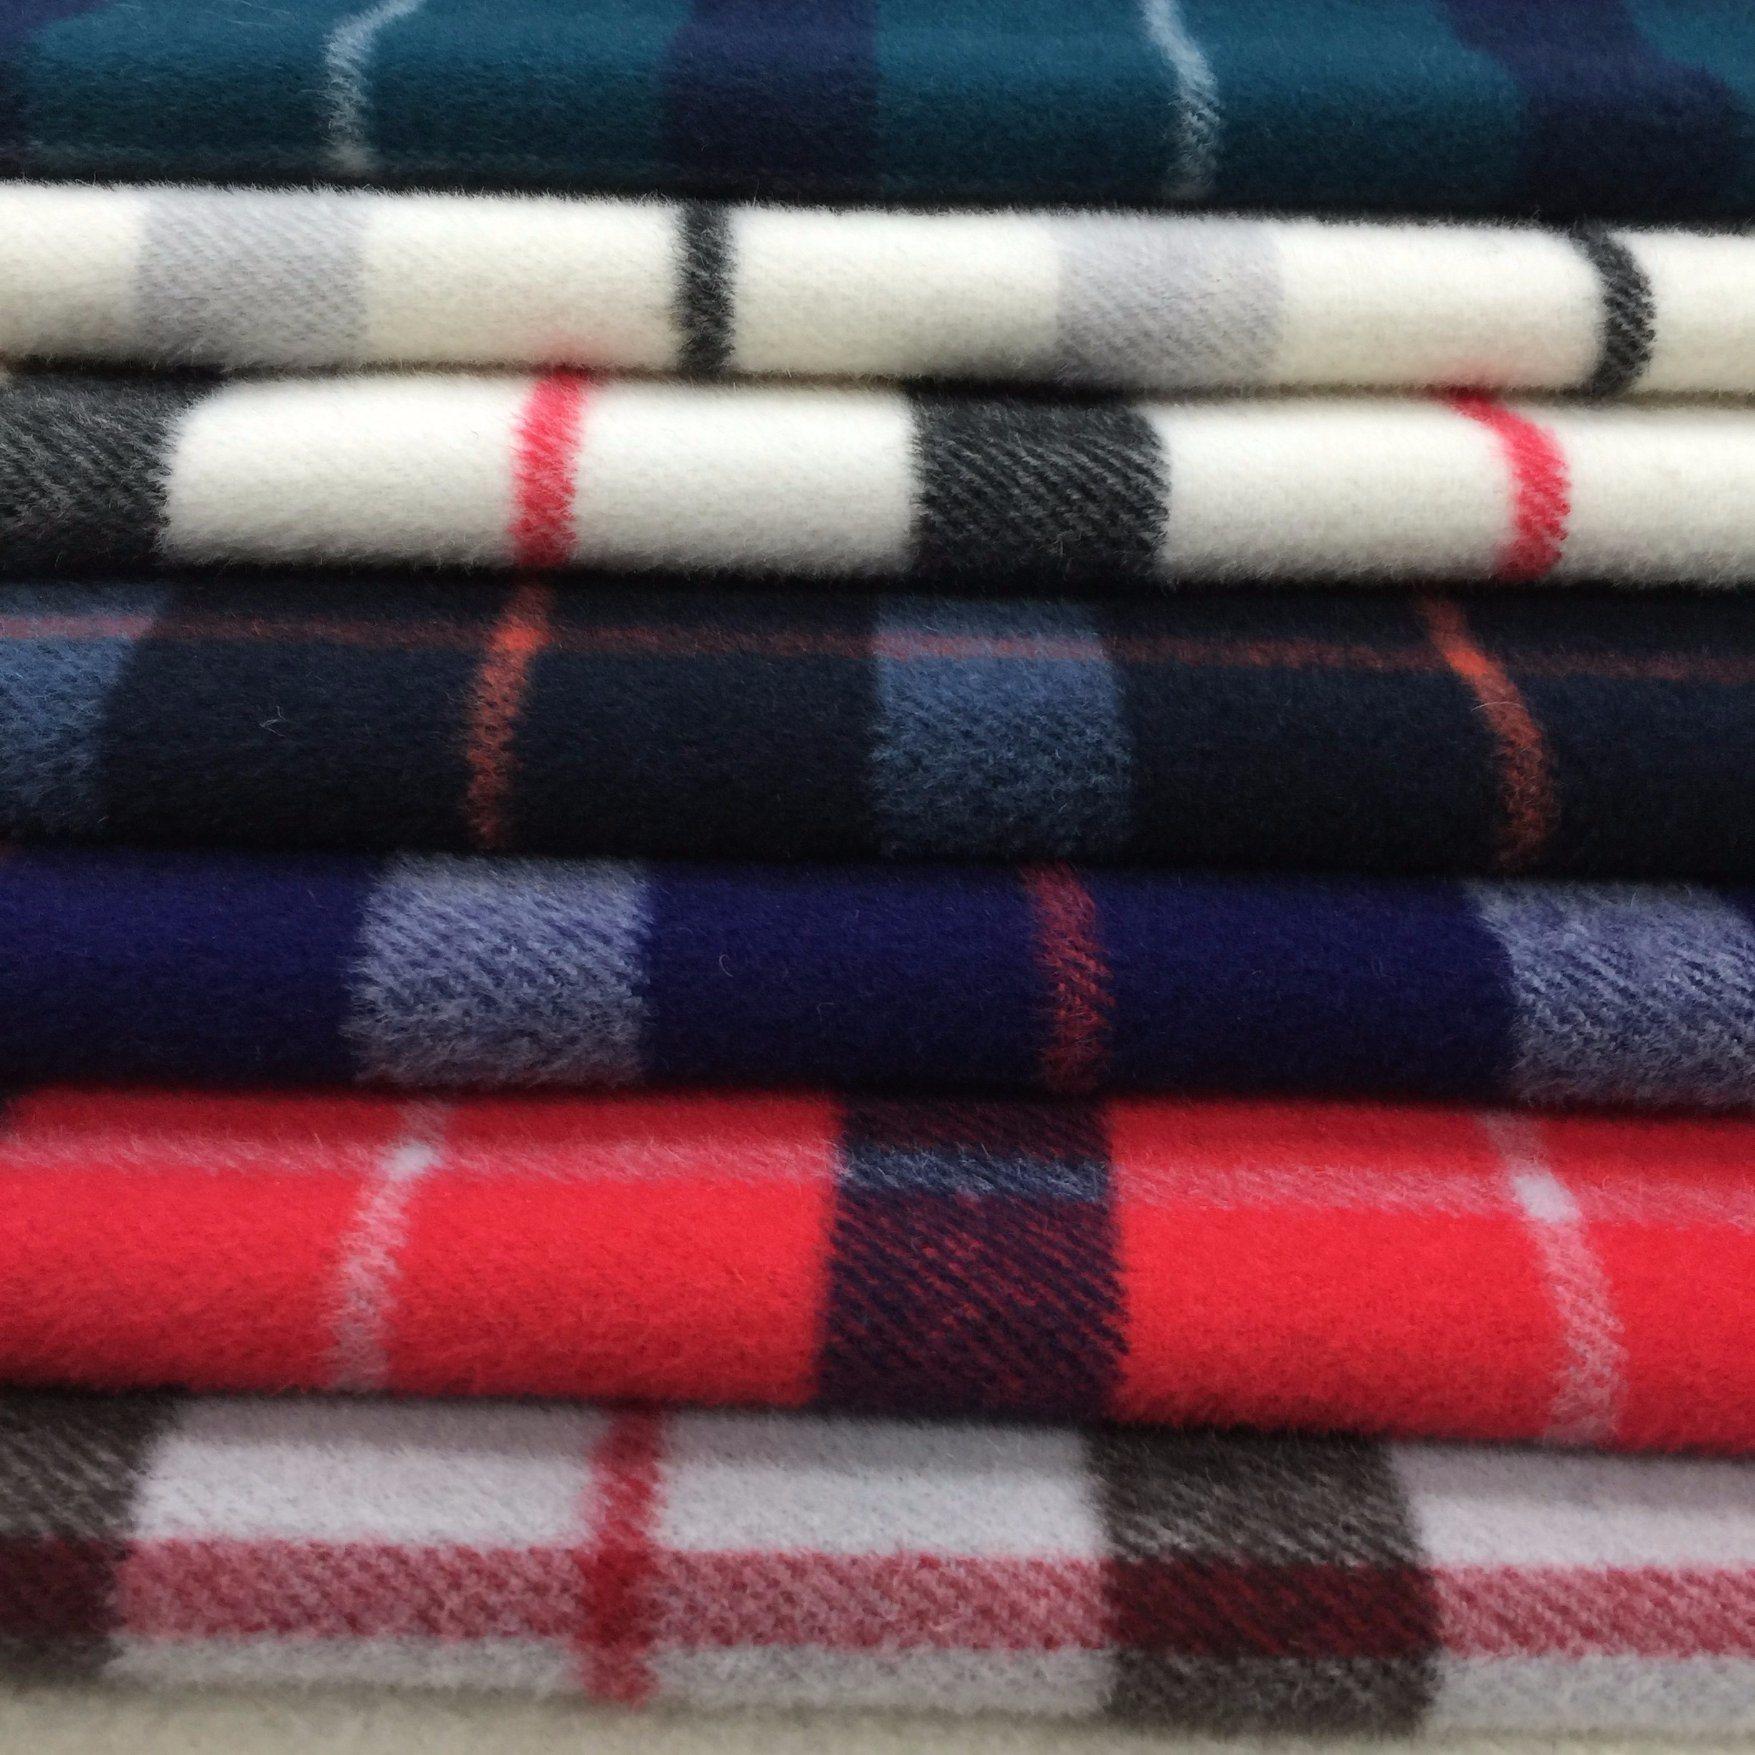 Twill Check Wool Fabric Overcoat